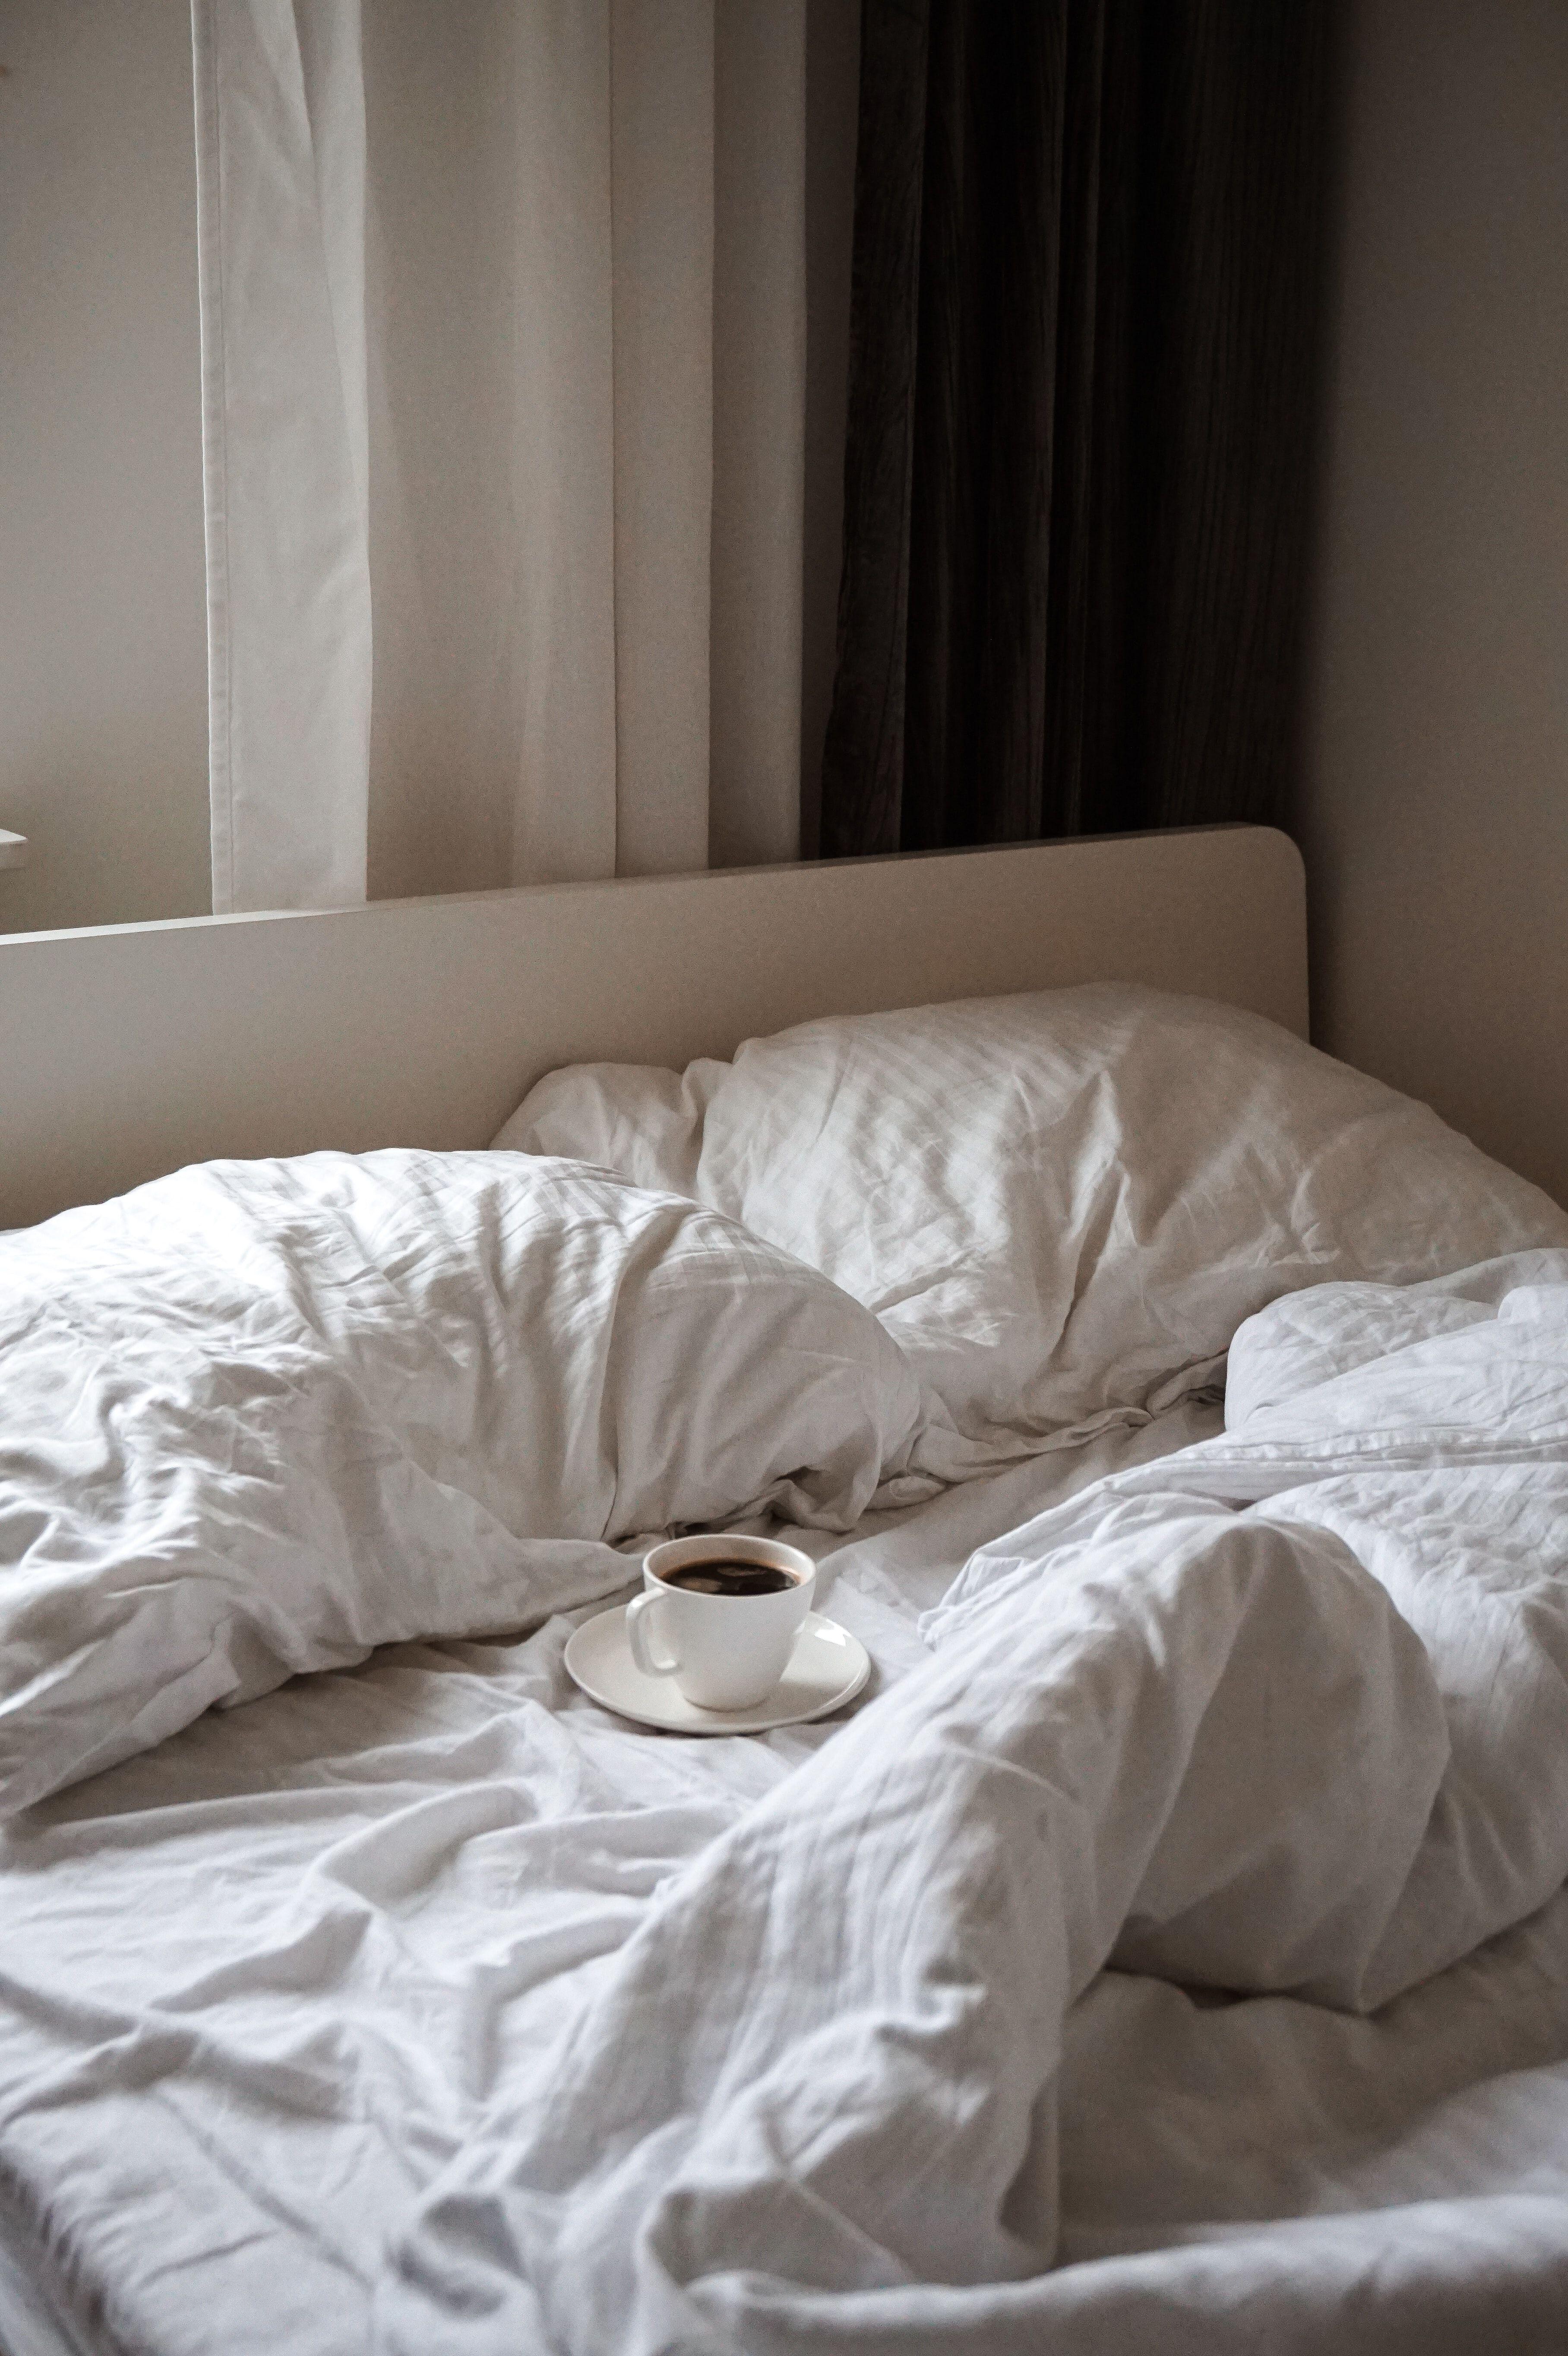 Foods that help you sleep | Coffee in bed | Proper